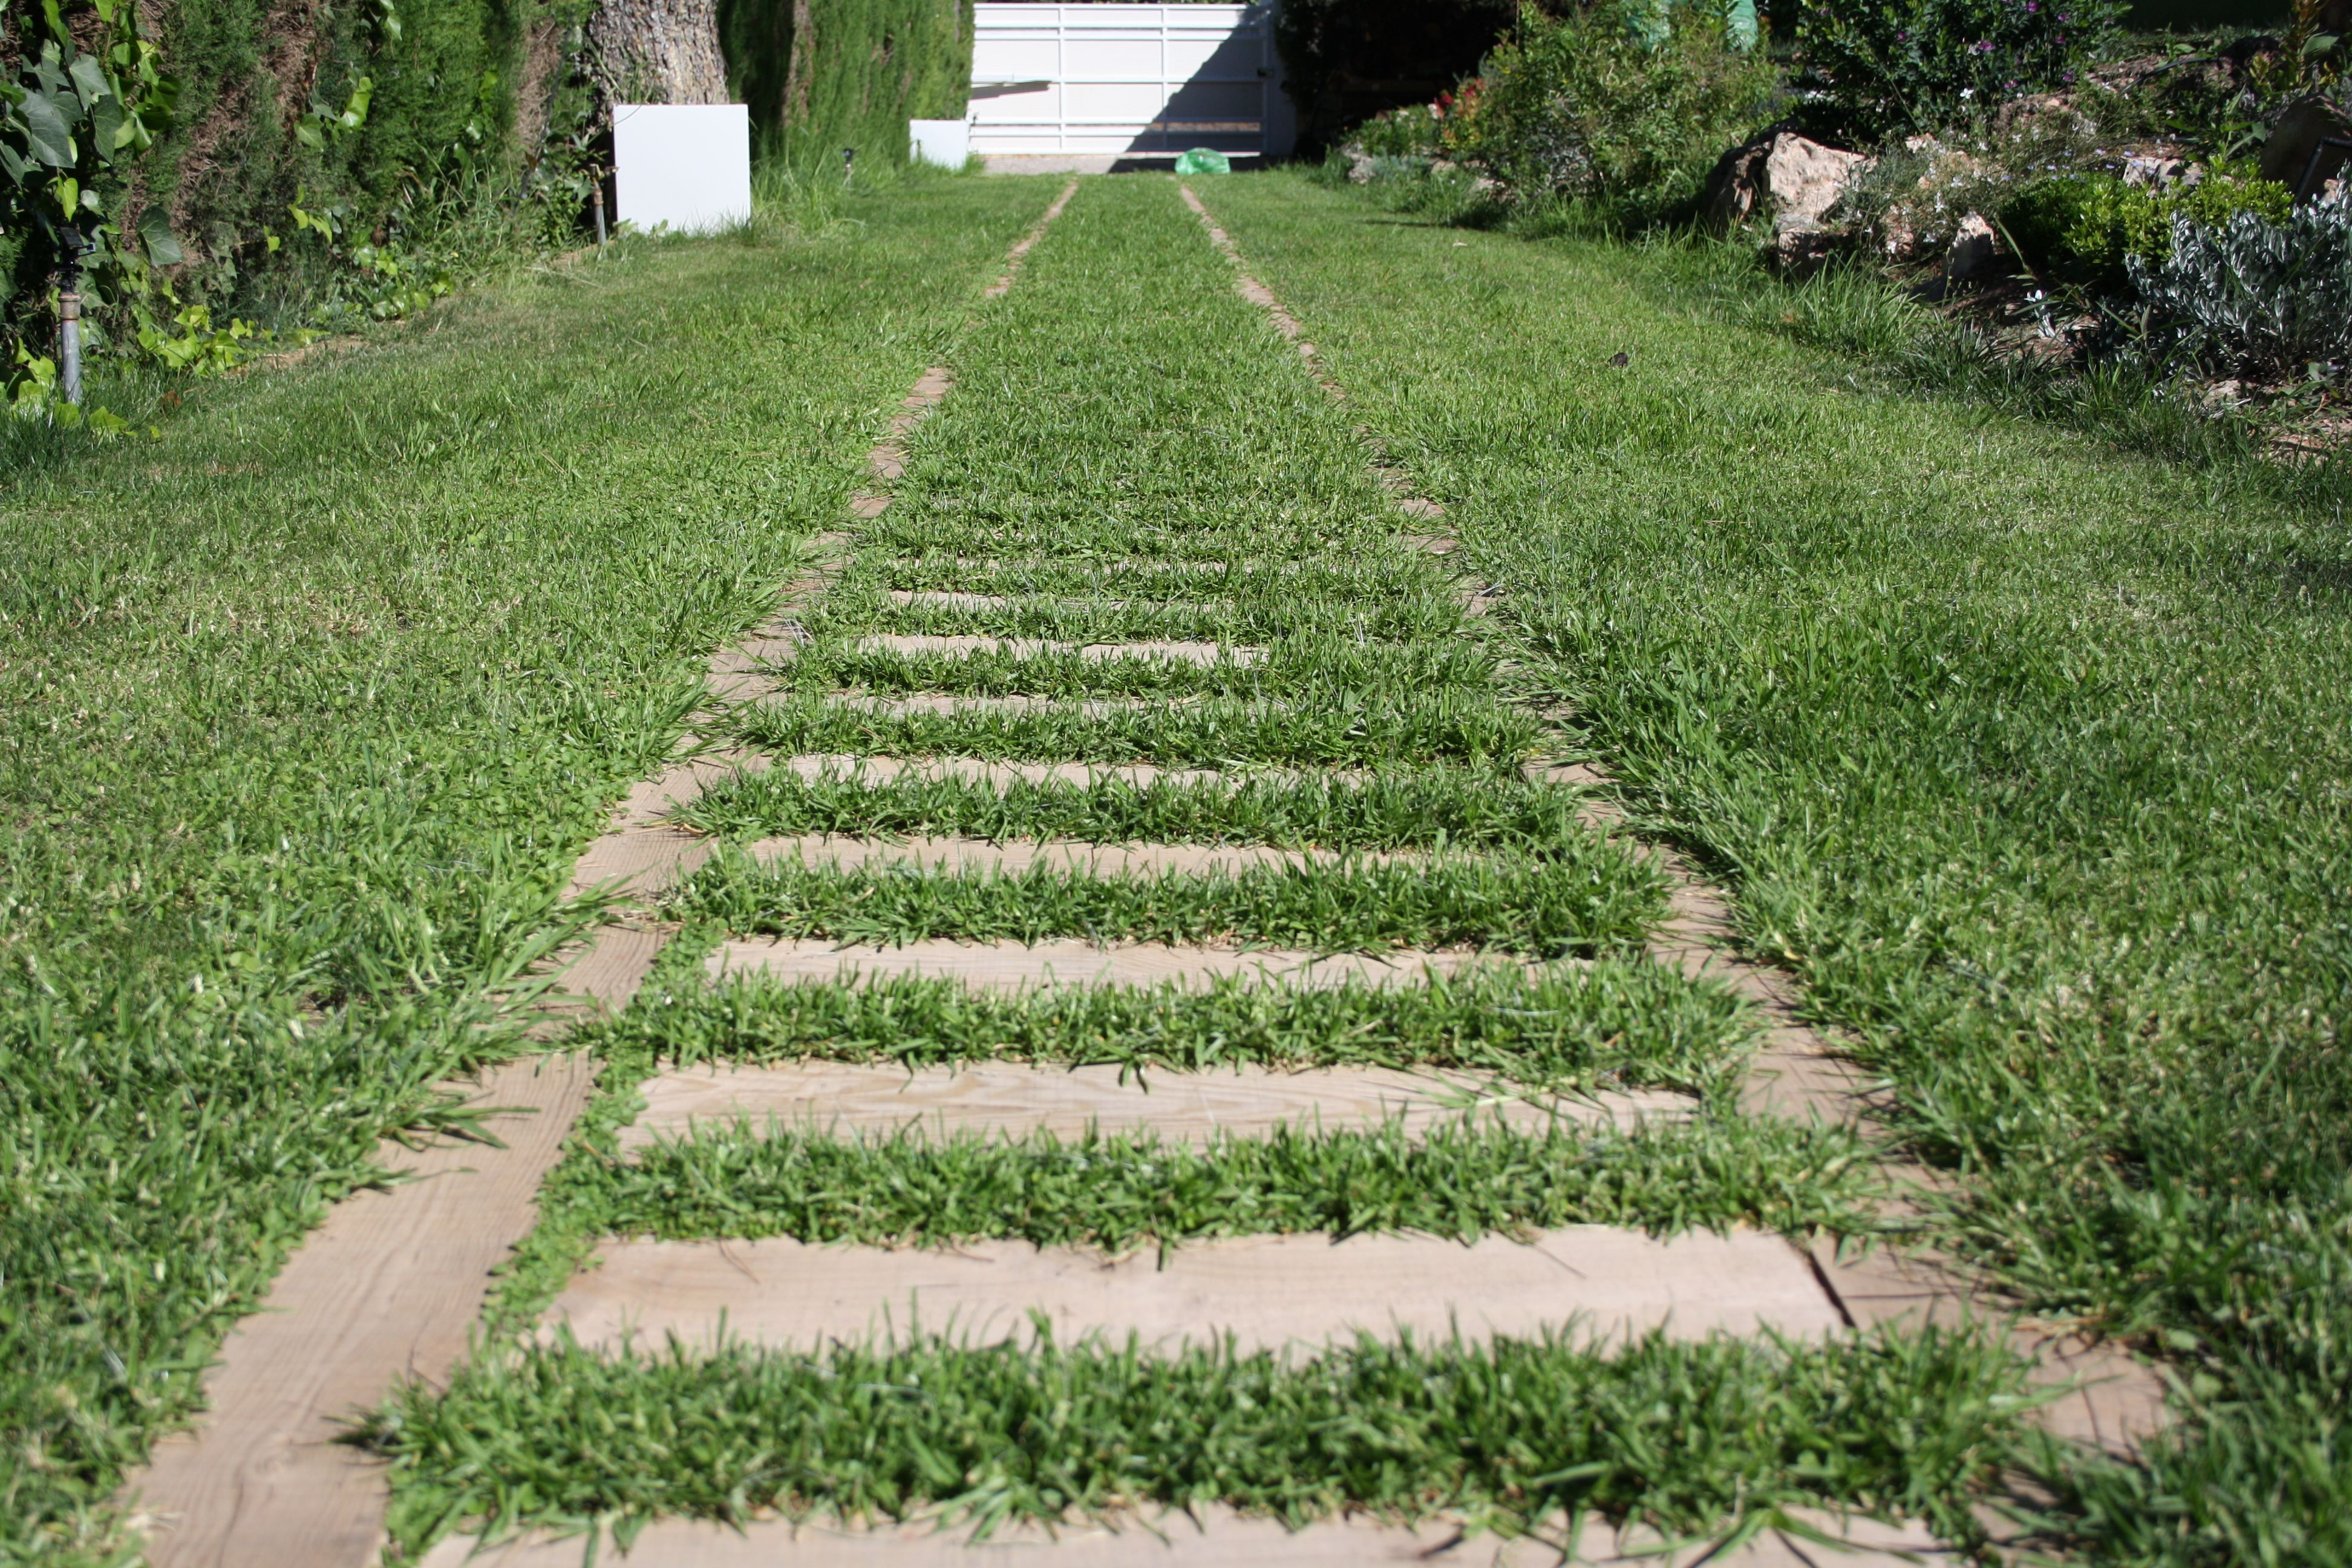 Instalaci n de traviesas de tren en jard n jard n madera - Traviesas de tren para jardin ...